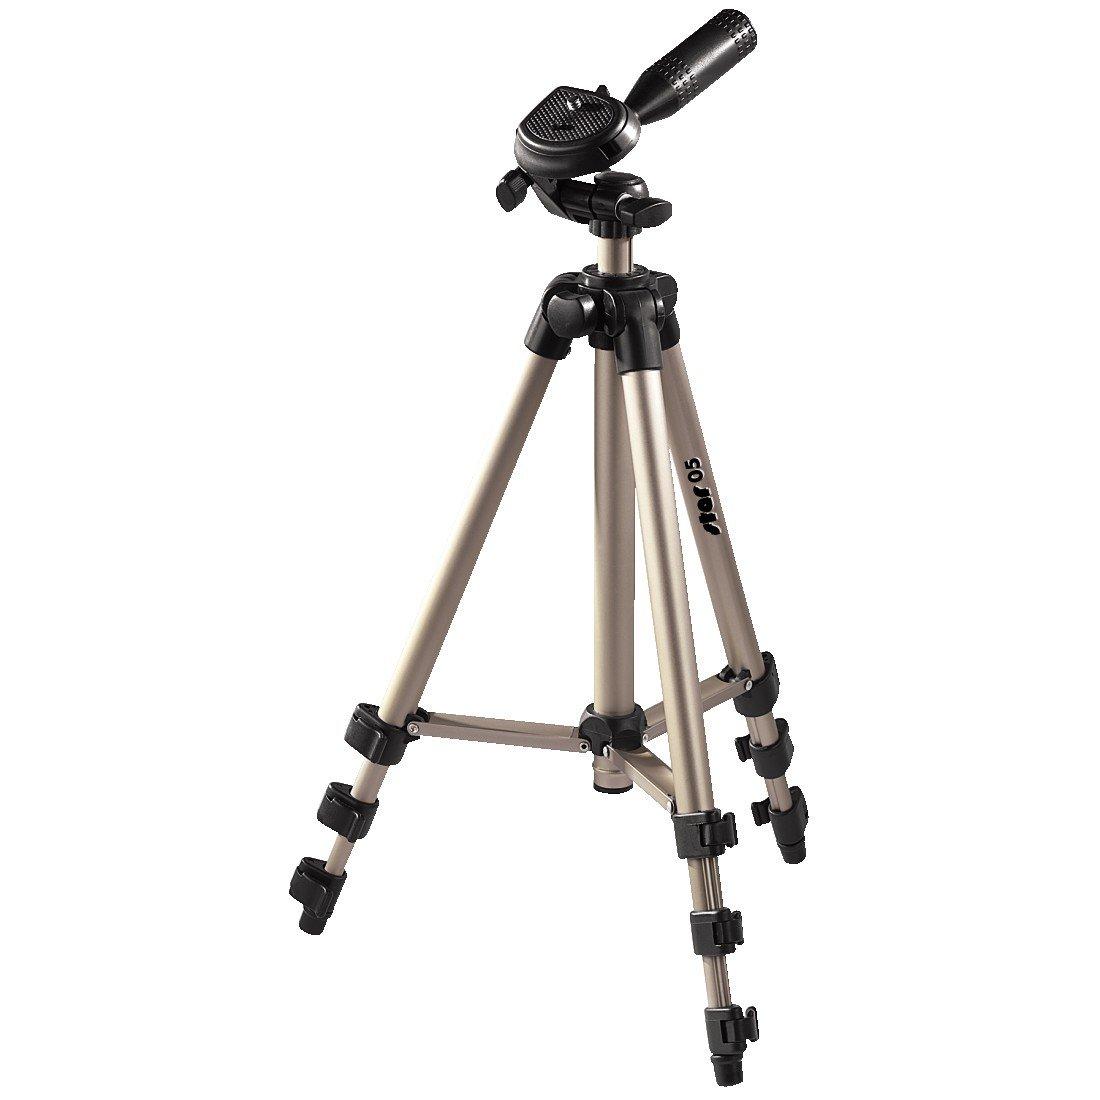 Hama Star Trípode para cámaras foto video  cm aluminio cabeza D